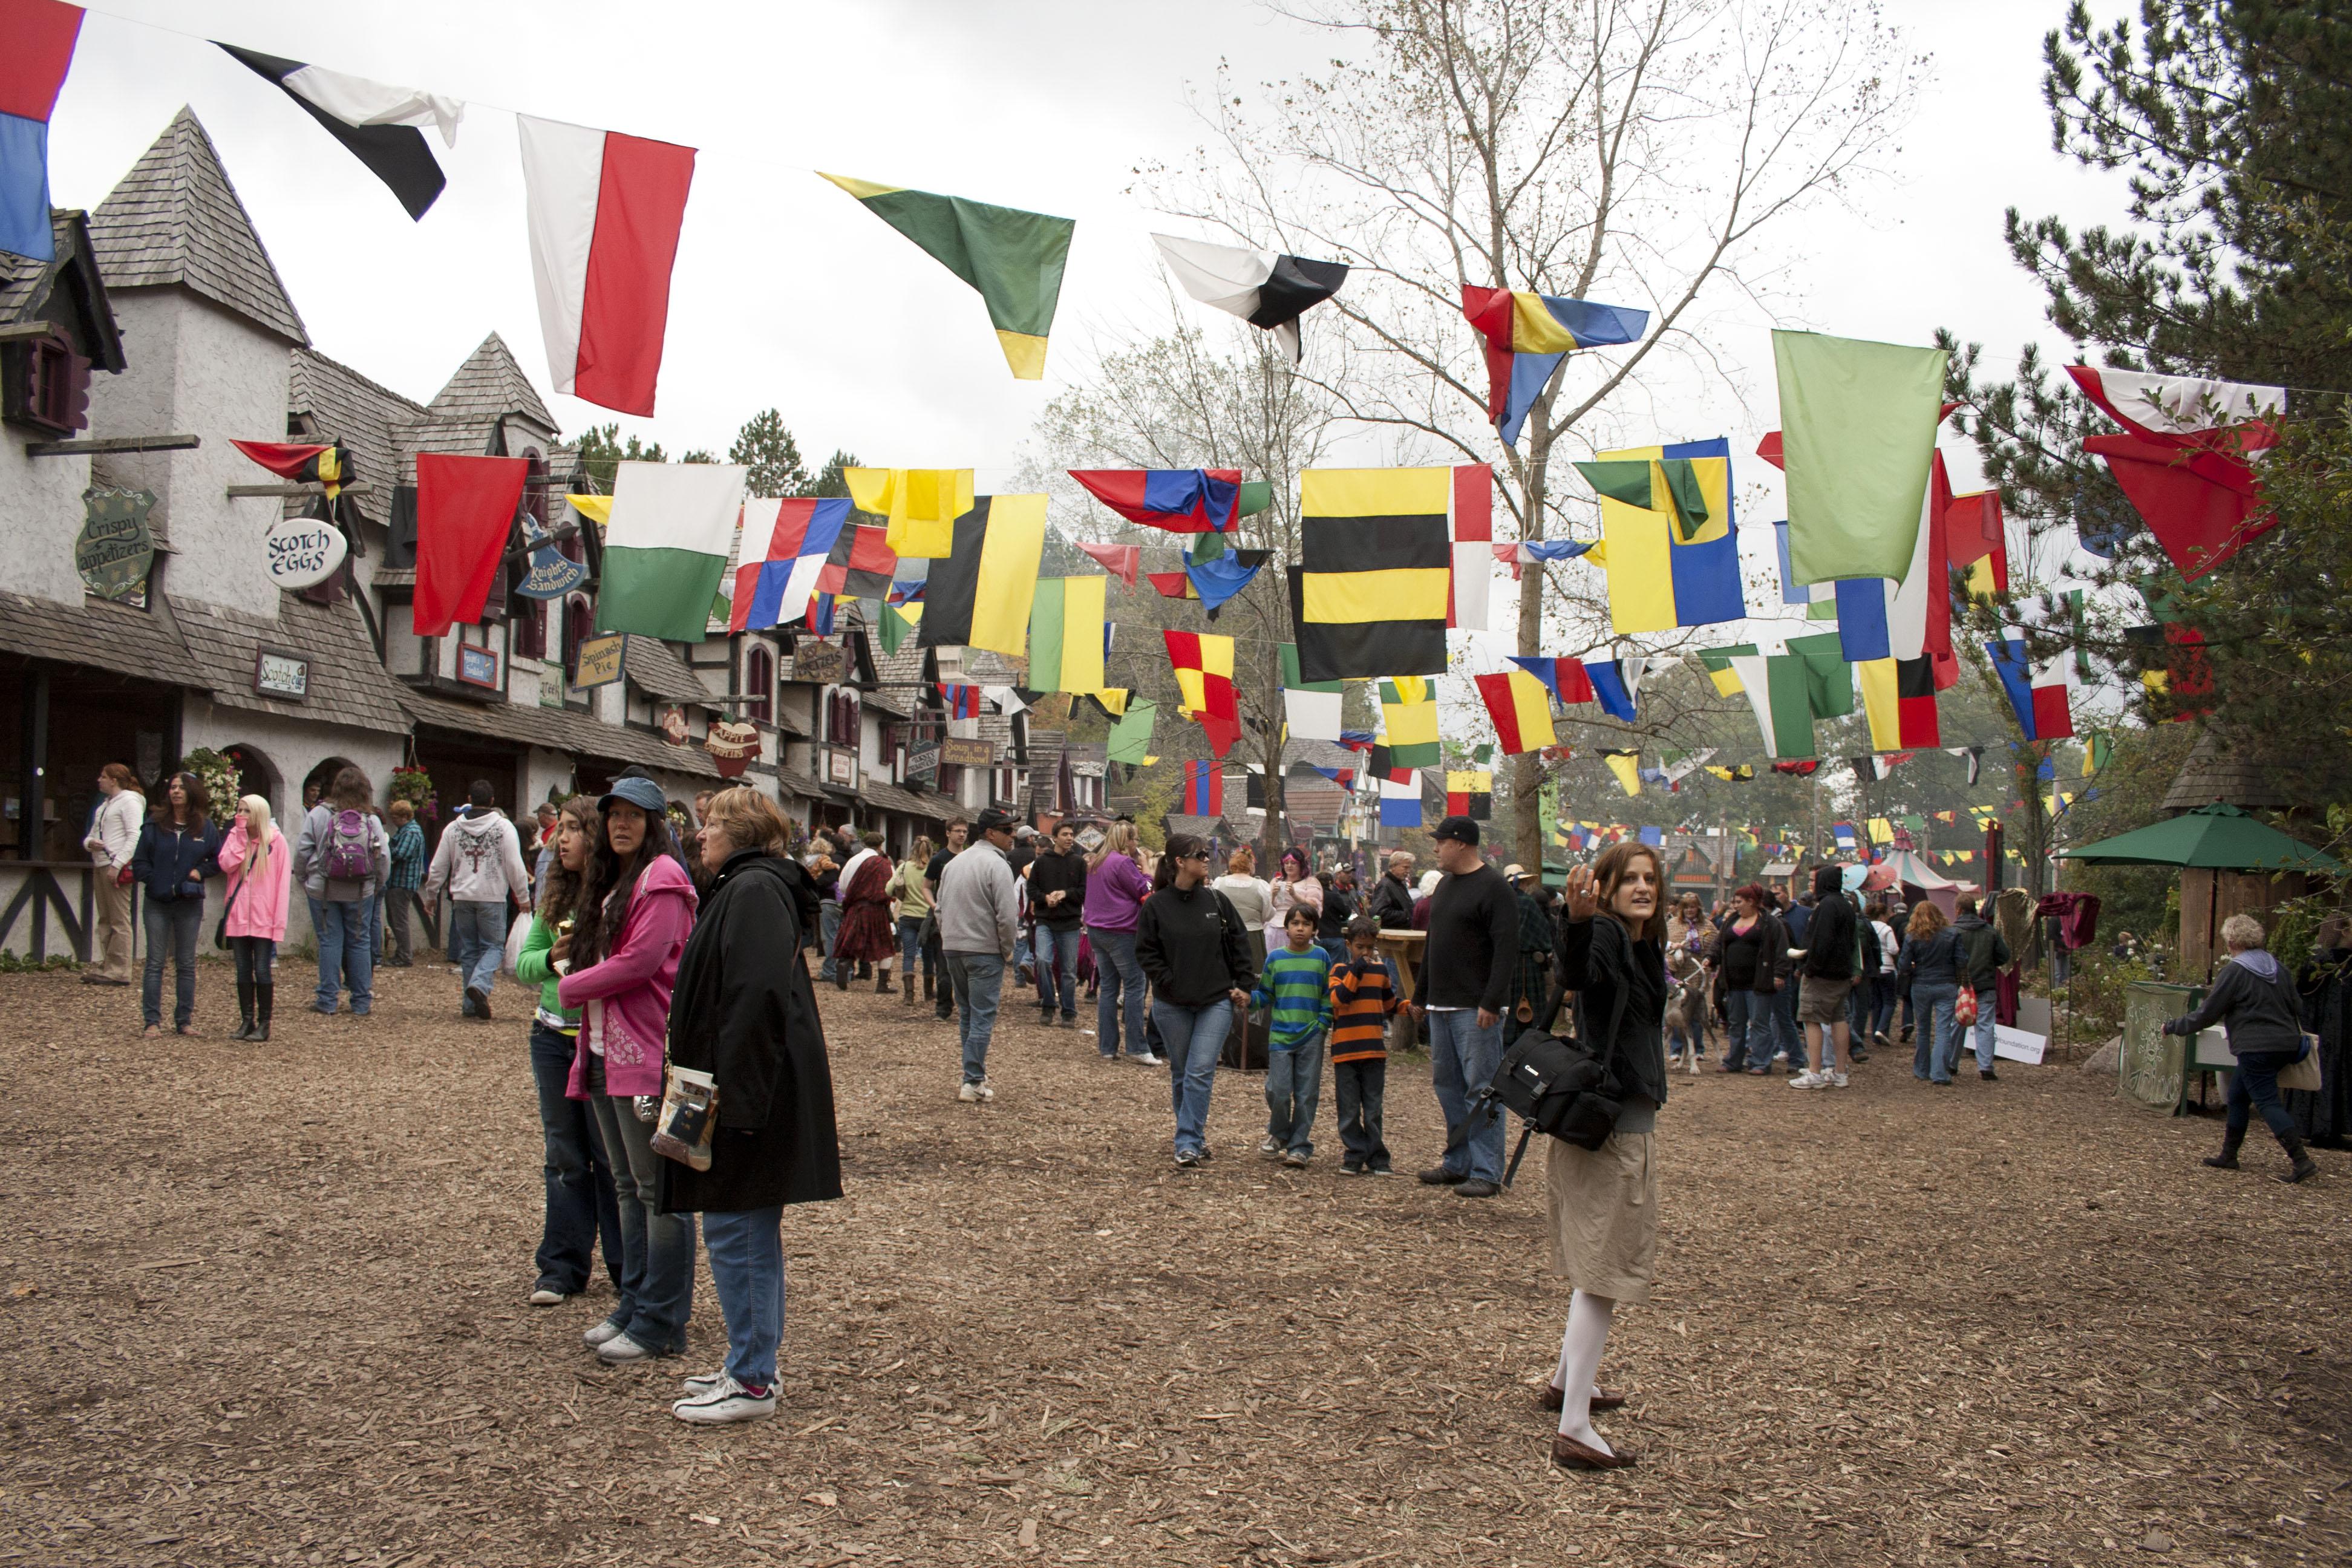 2010 Renaissance Festival in Holly.